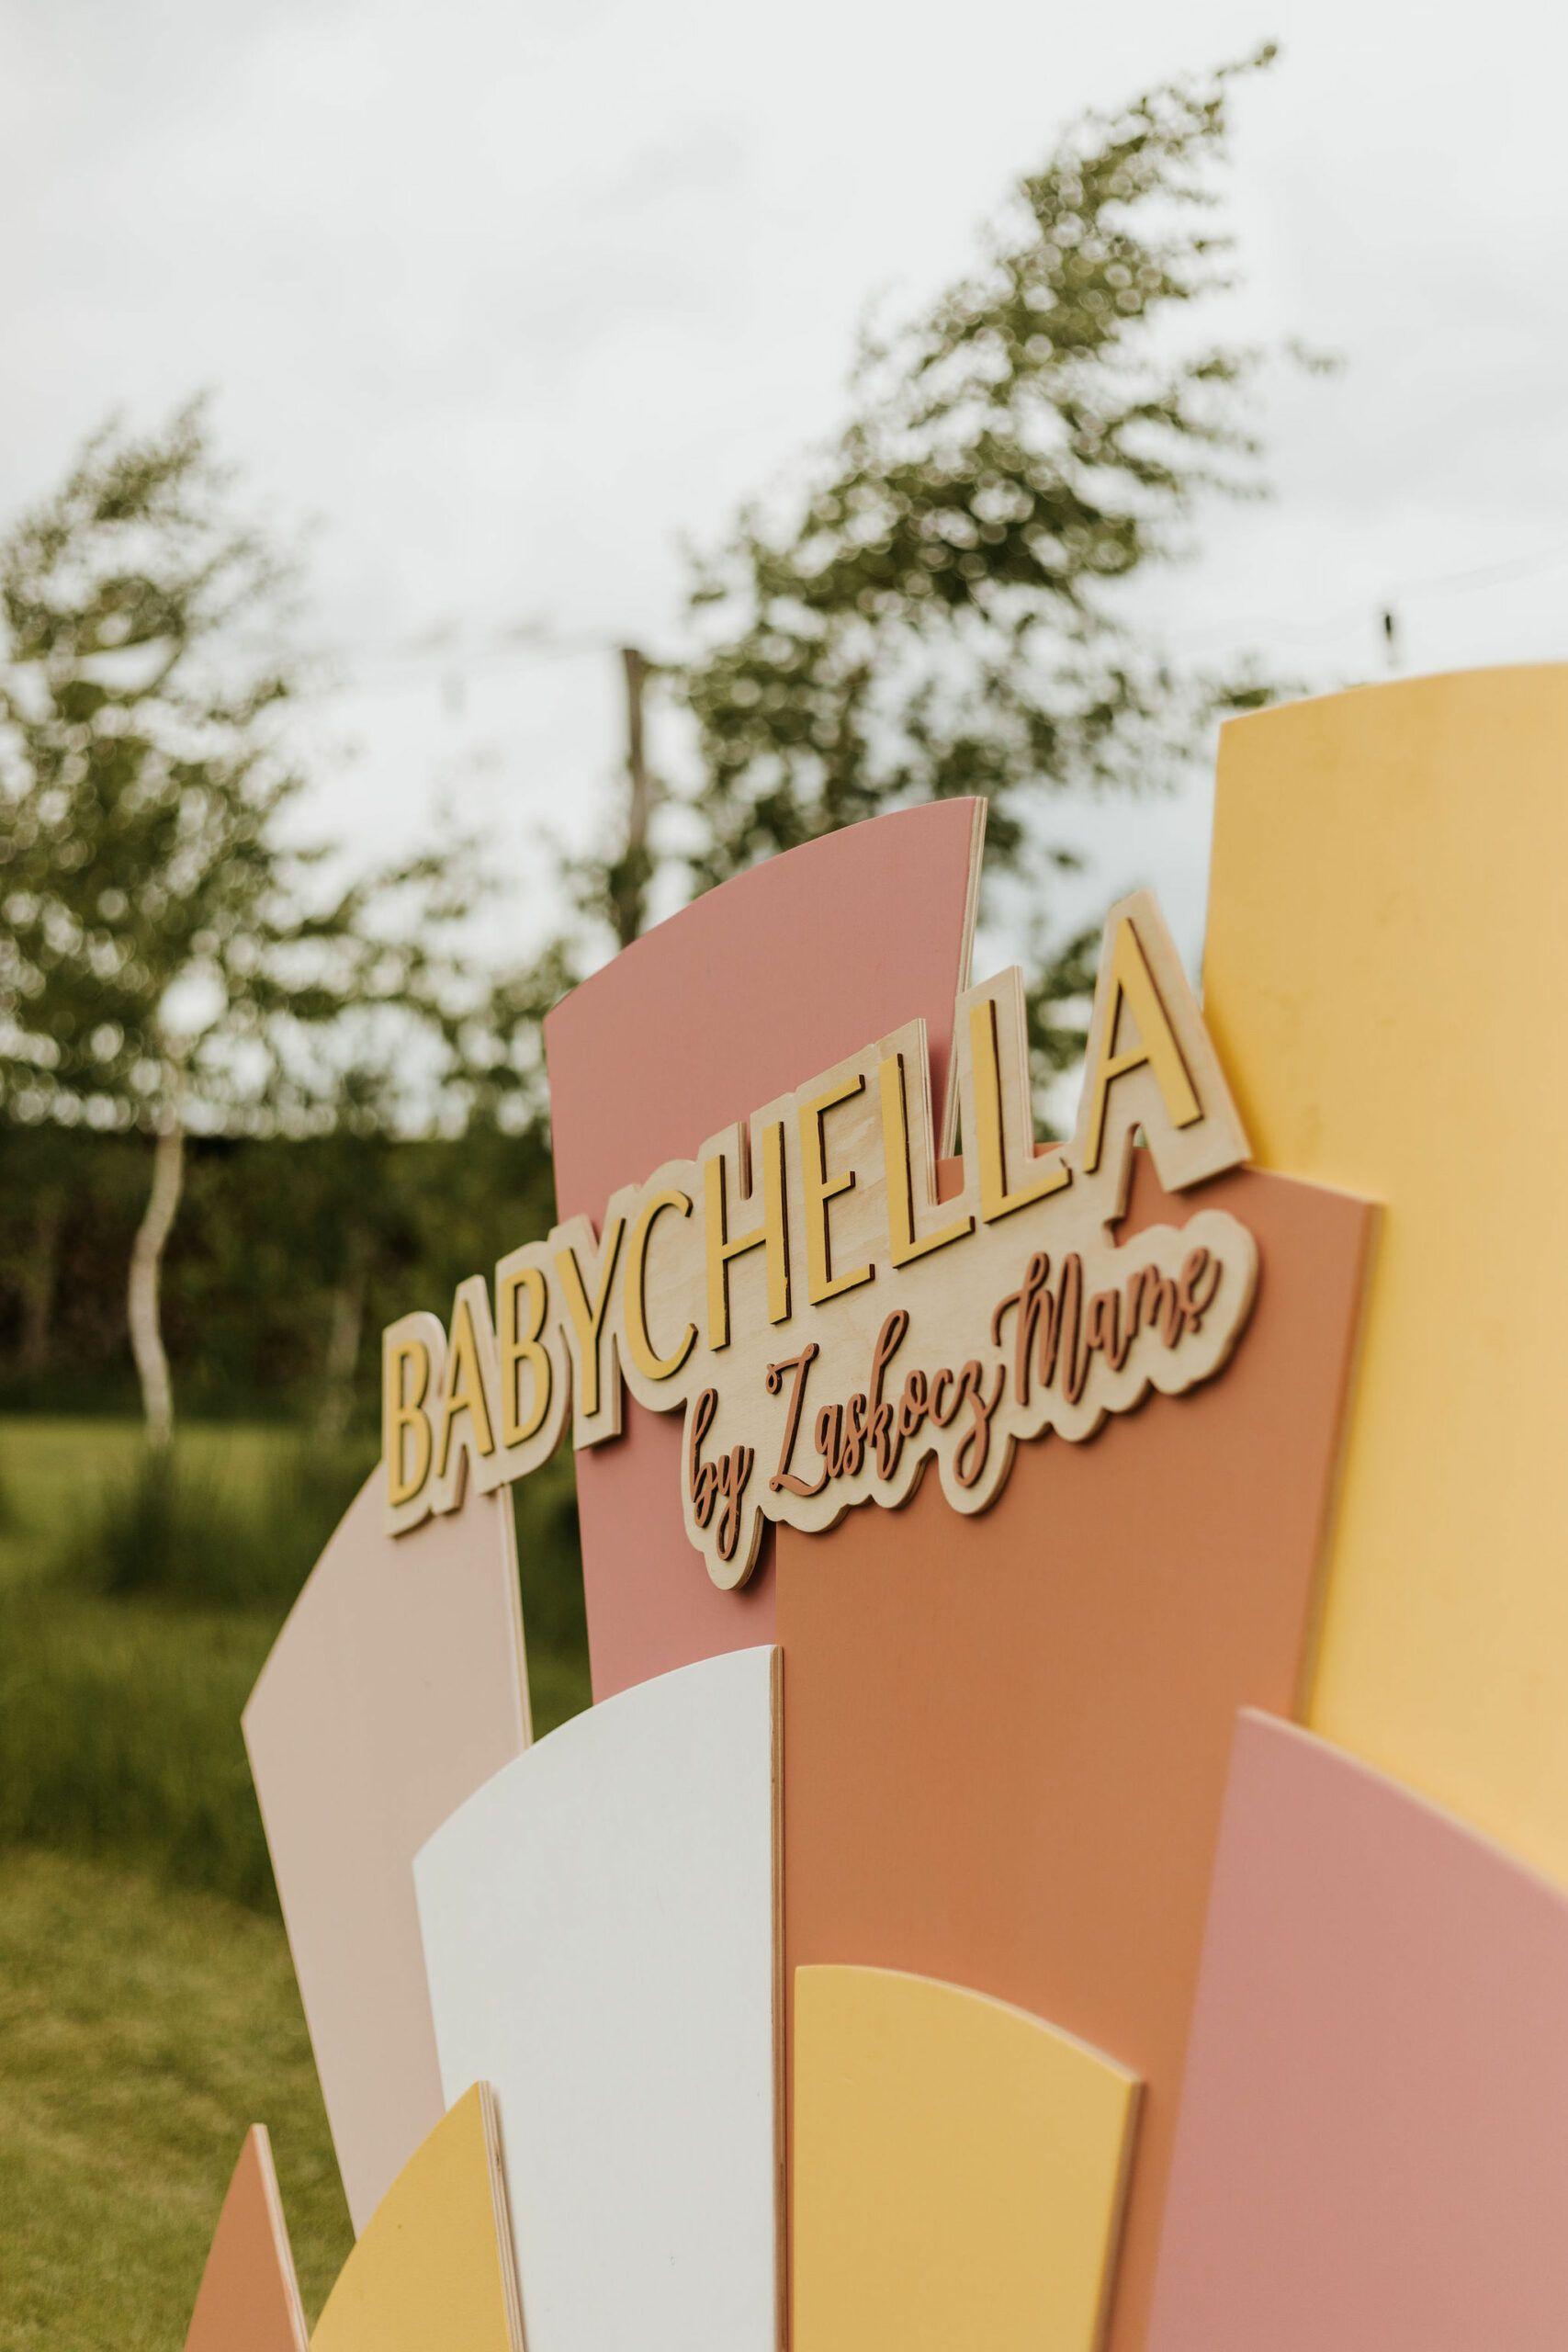 babychella_maj21_charlottesse-108